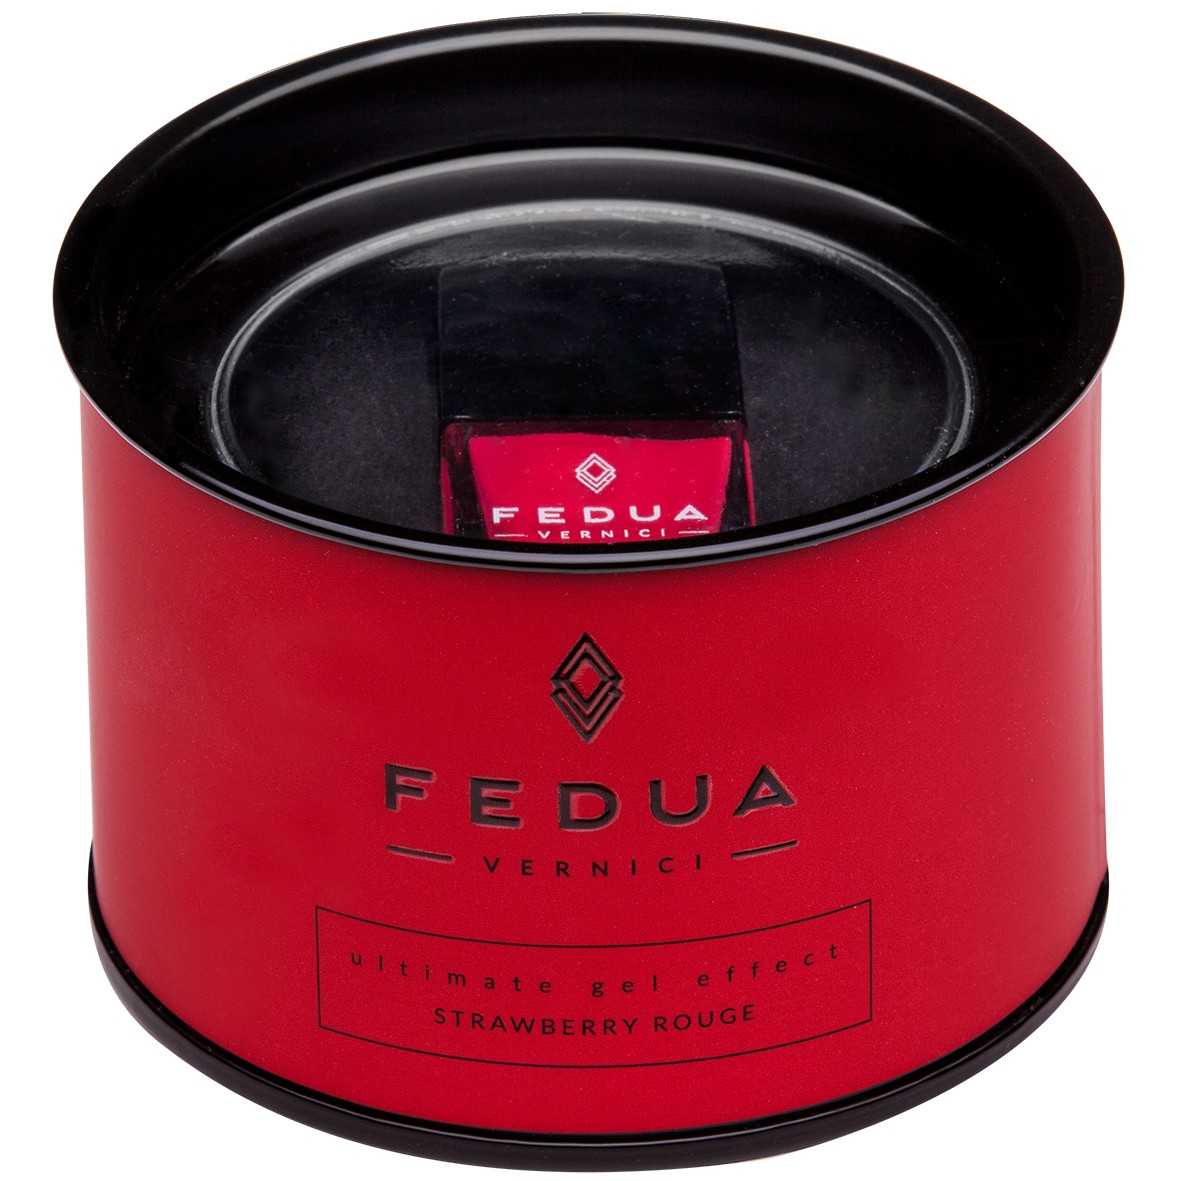 Strawberry Rouge - FEDUA